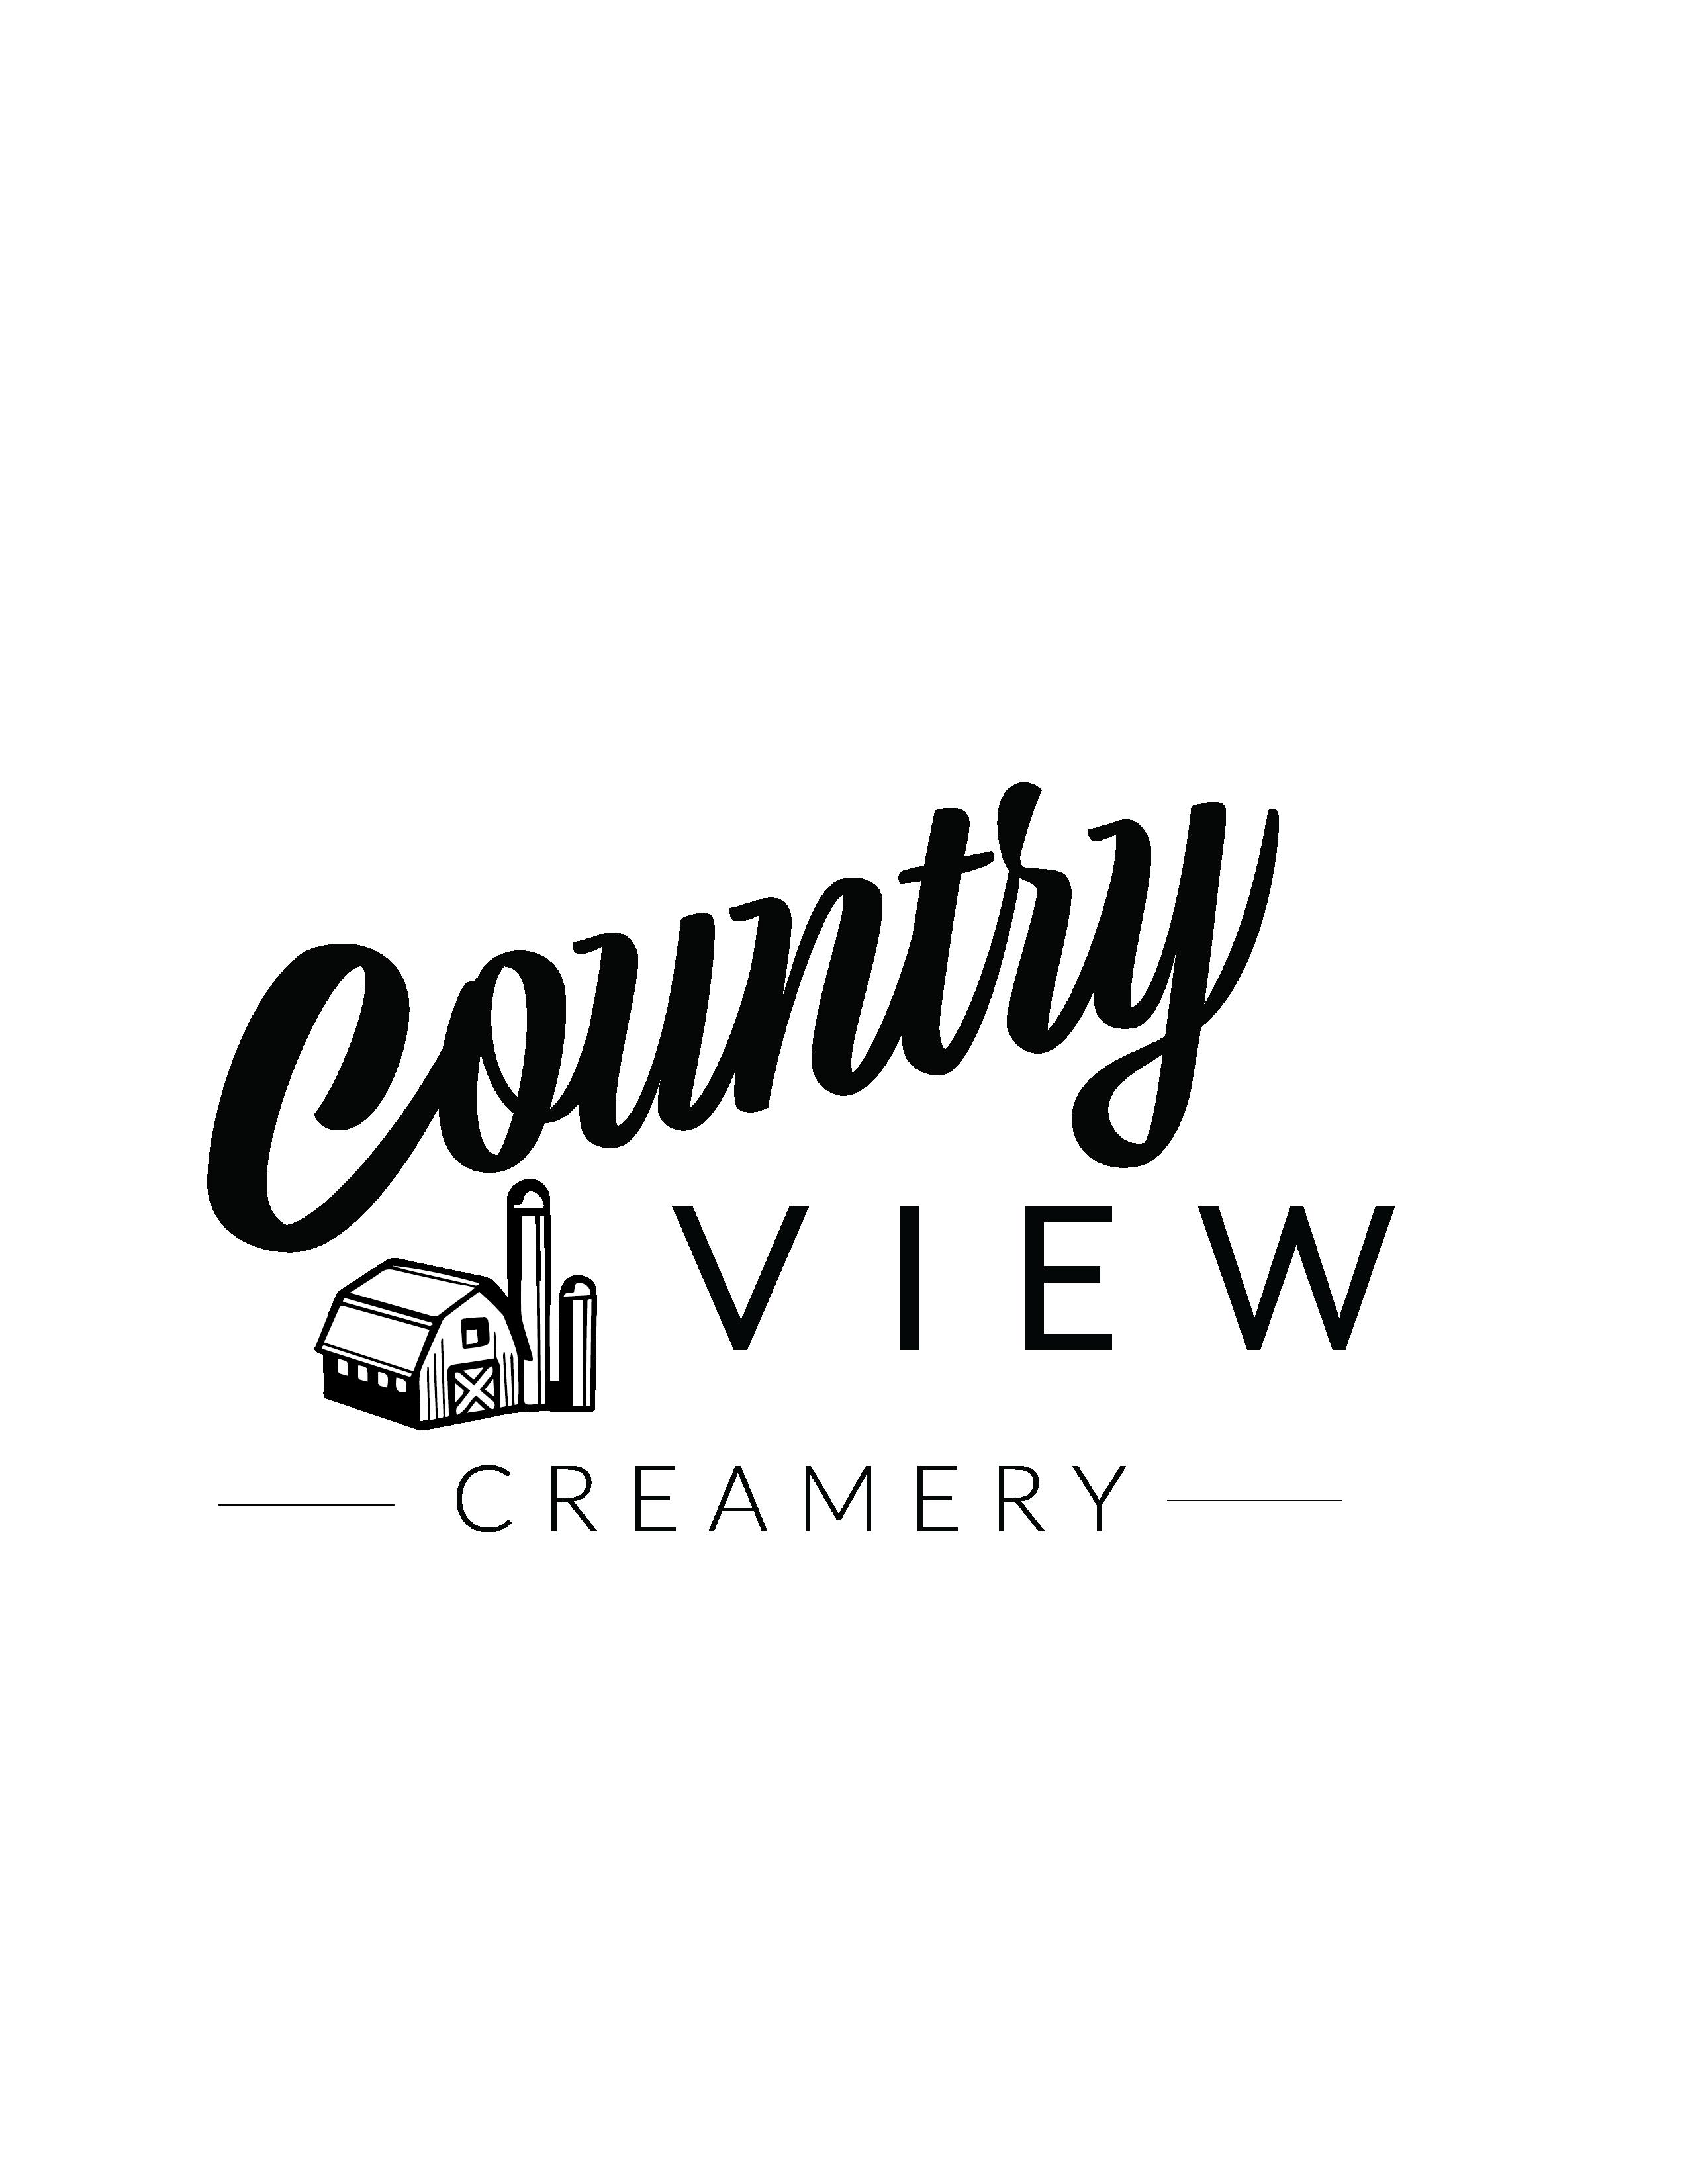 Country View Creamery Logo Design